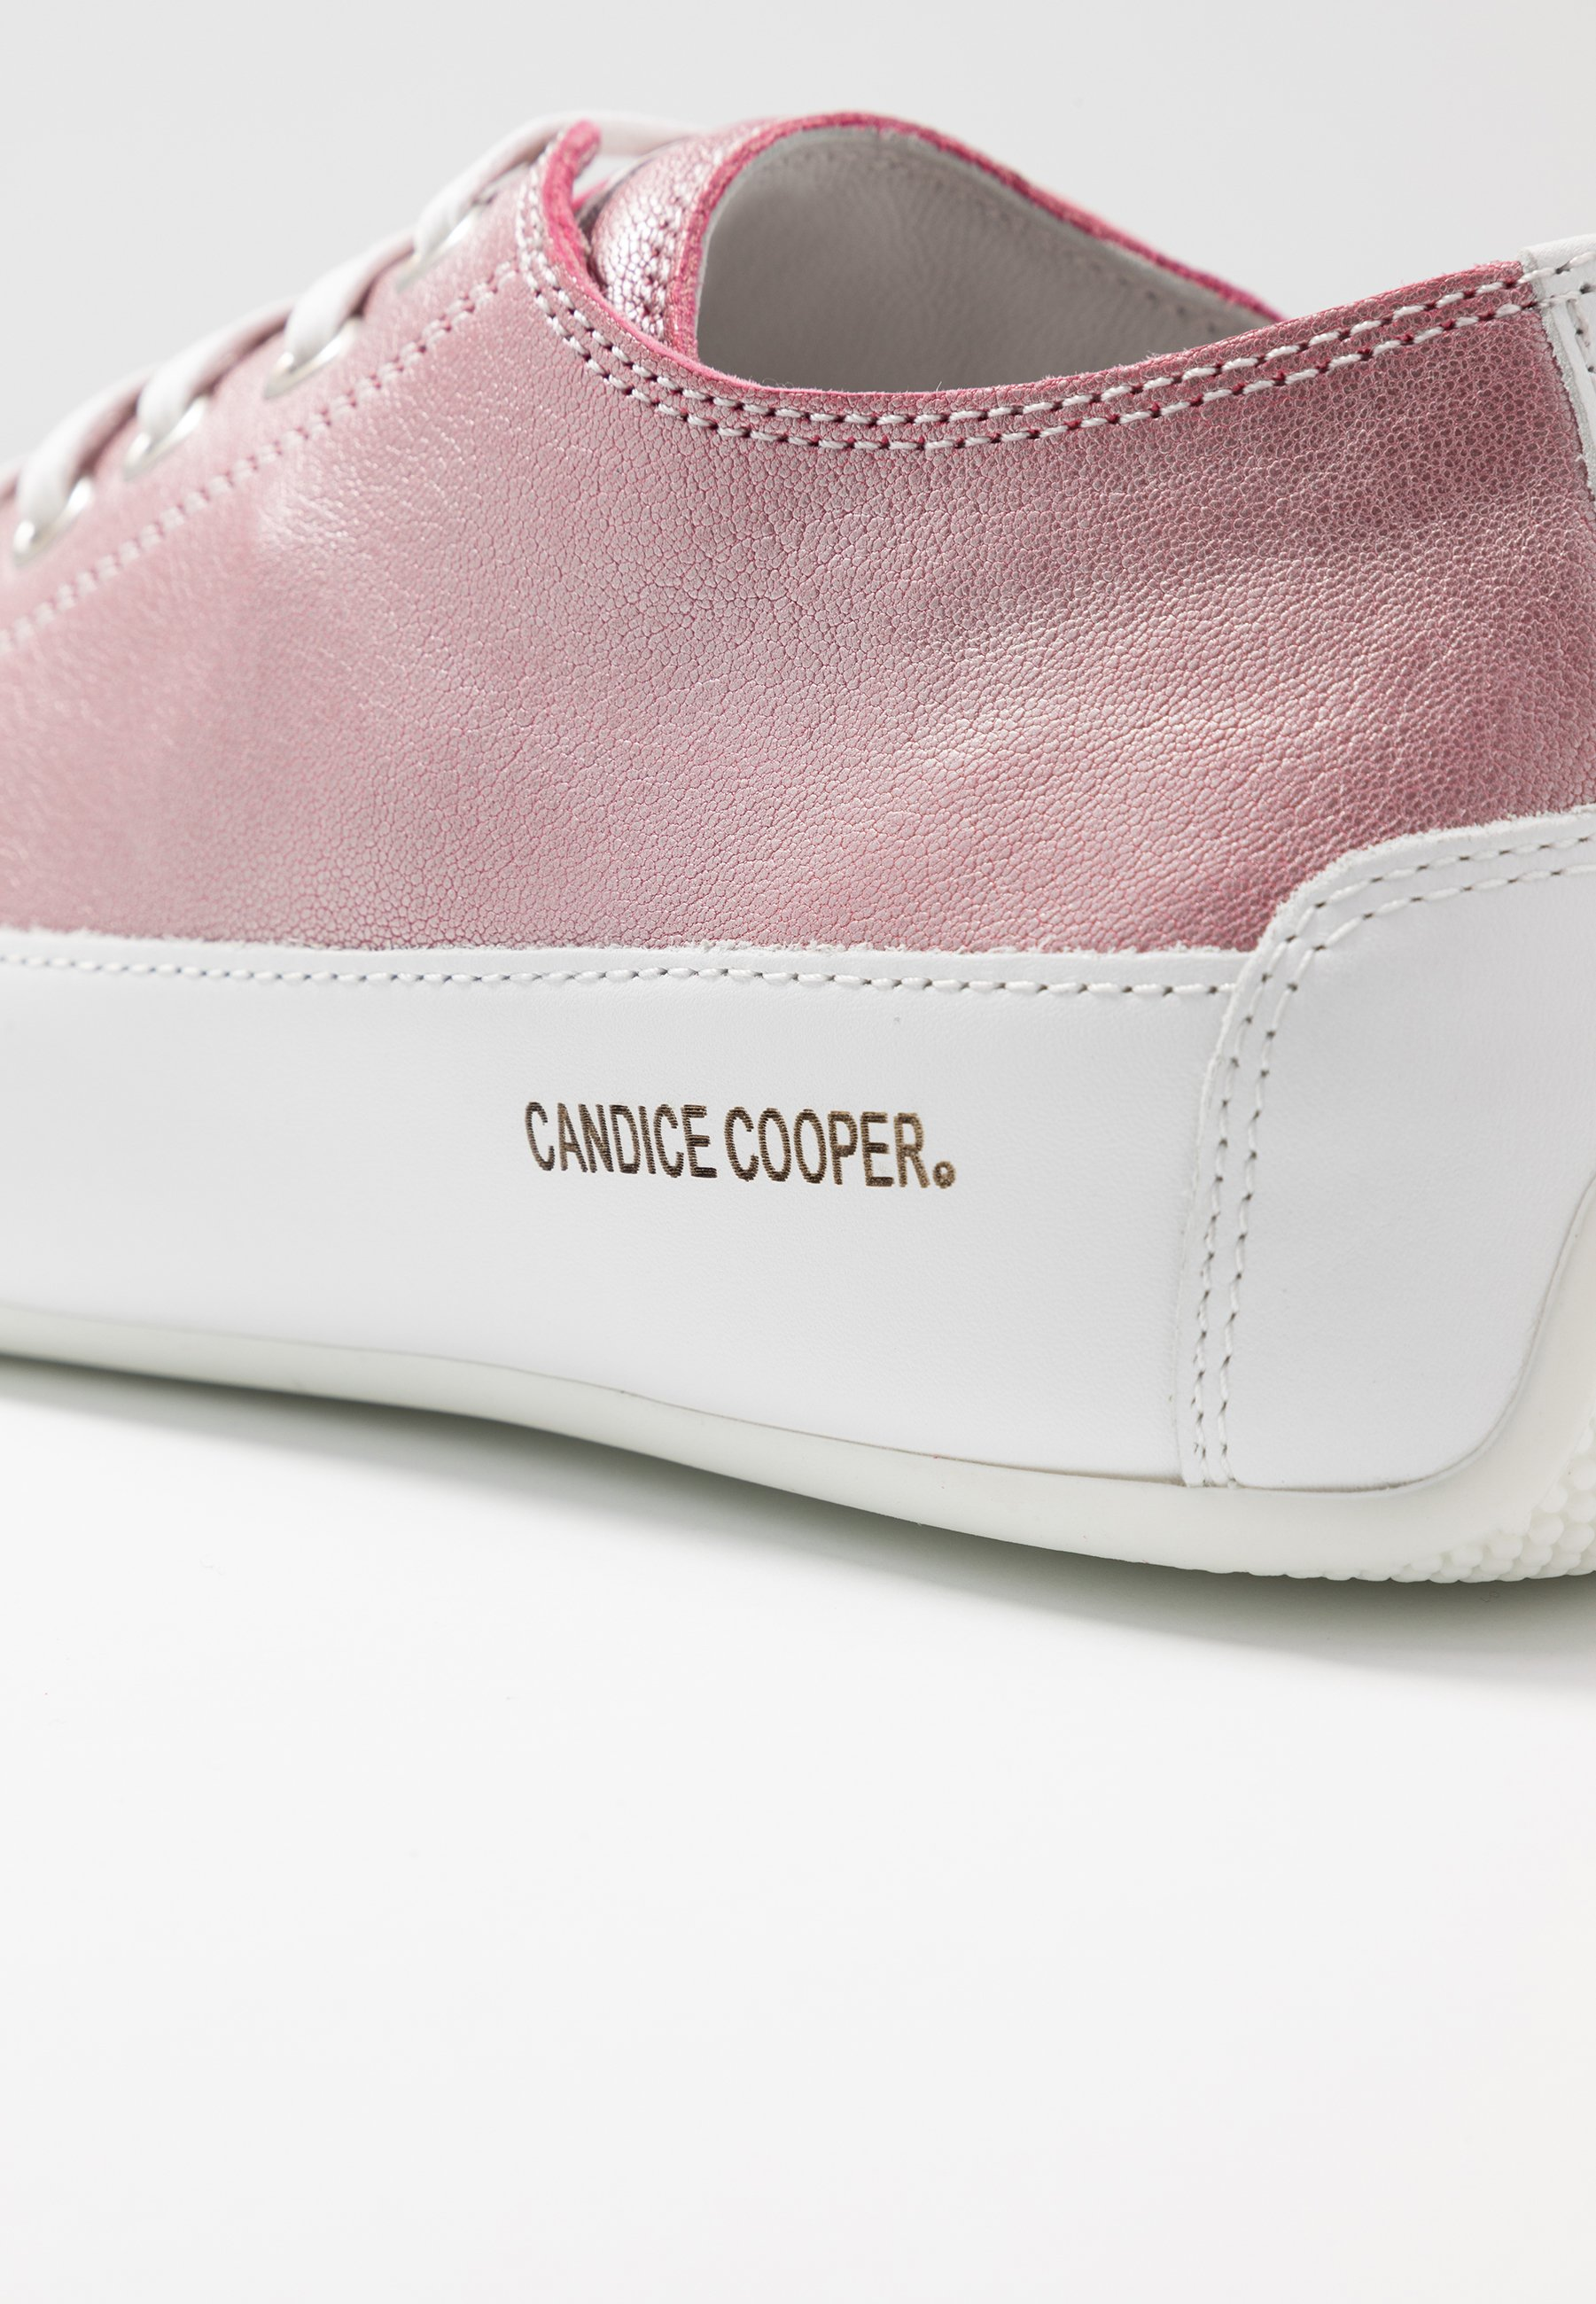 Candice Cooper ROCK Joggesko rosabianco Zalando.no